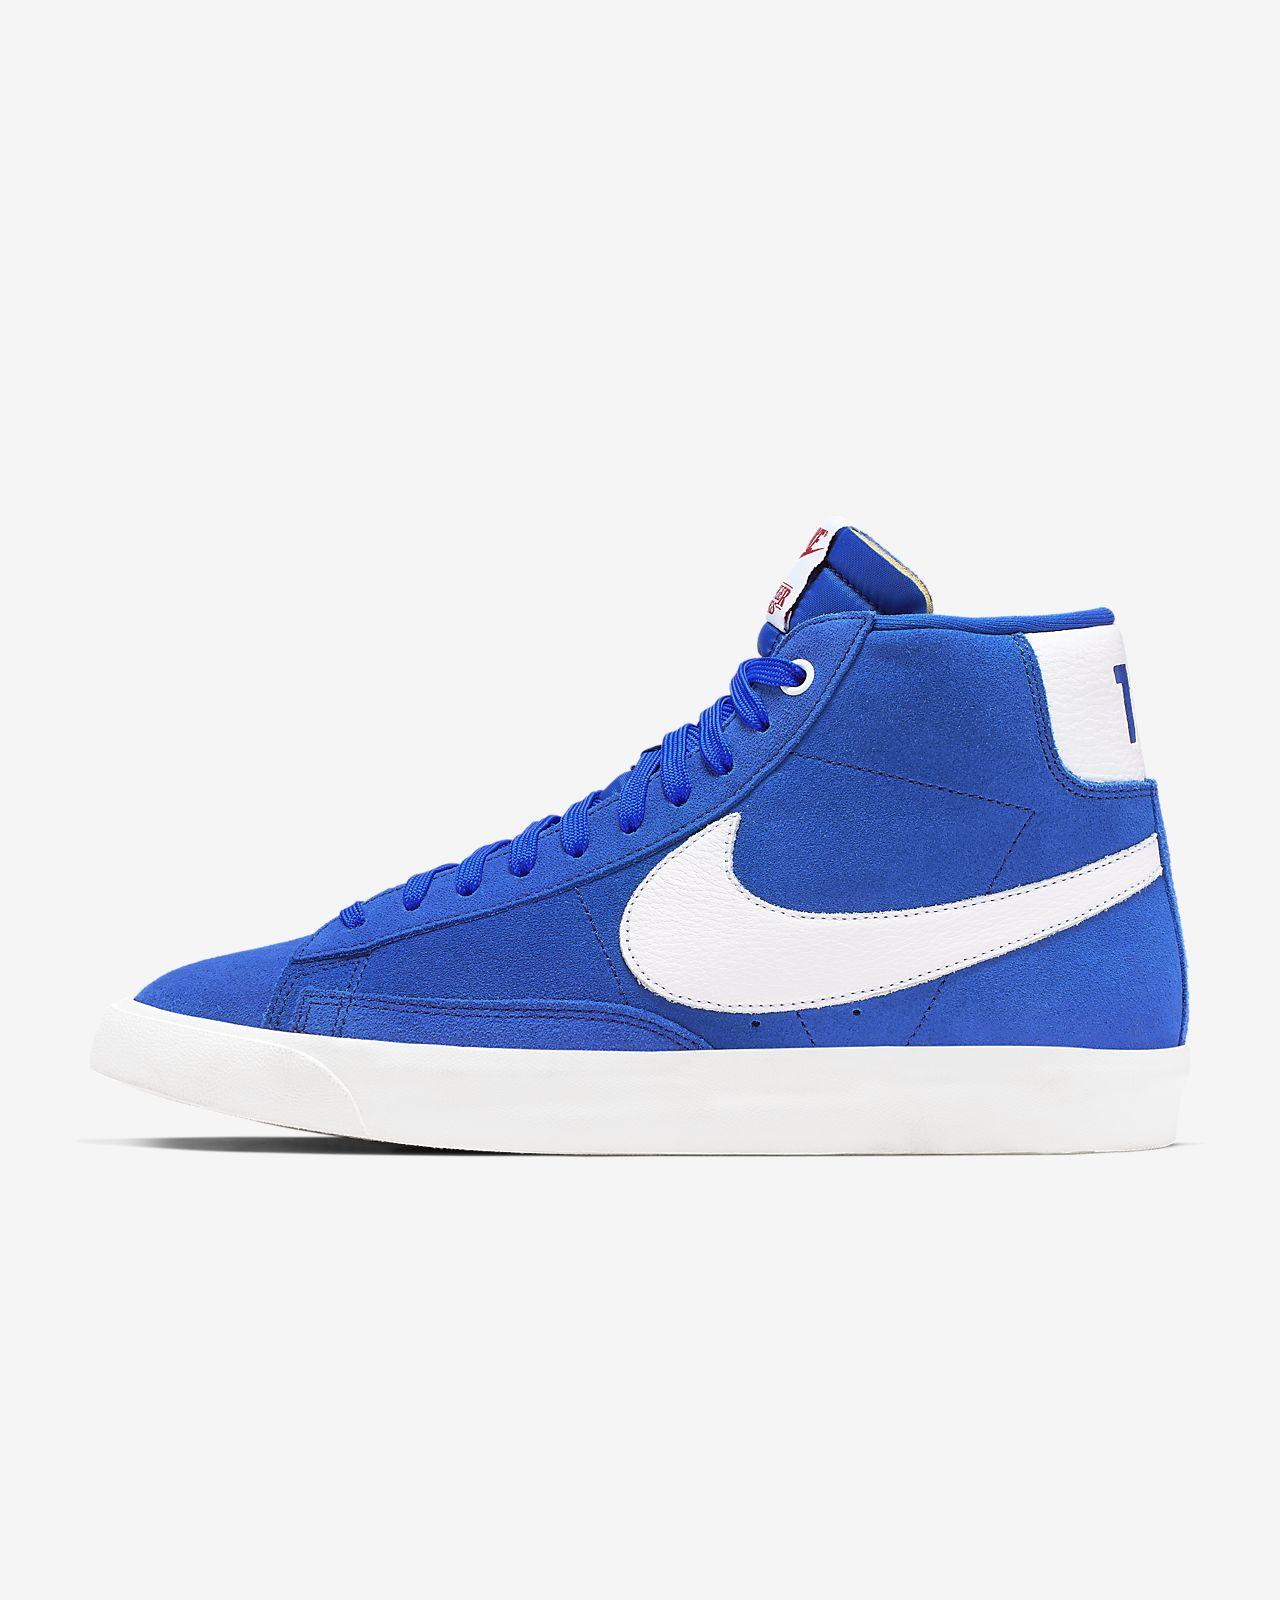 Nike x Stranger Things Blazer Mid (7 月 4 日) 男鞋